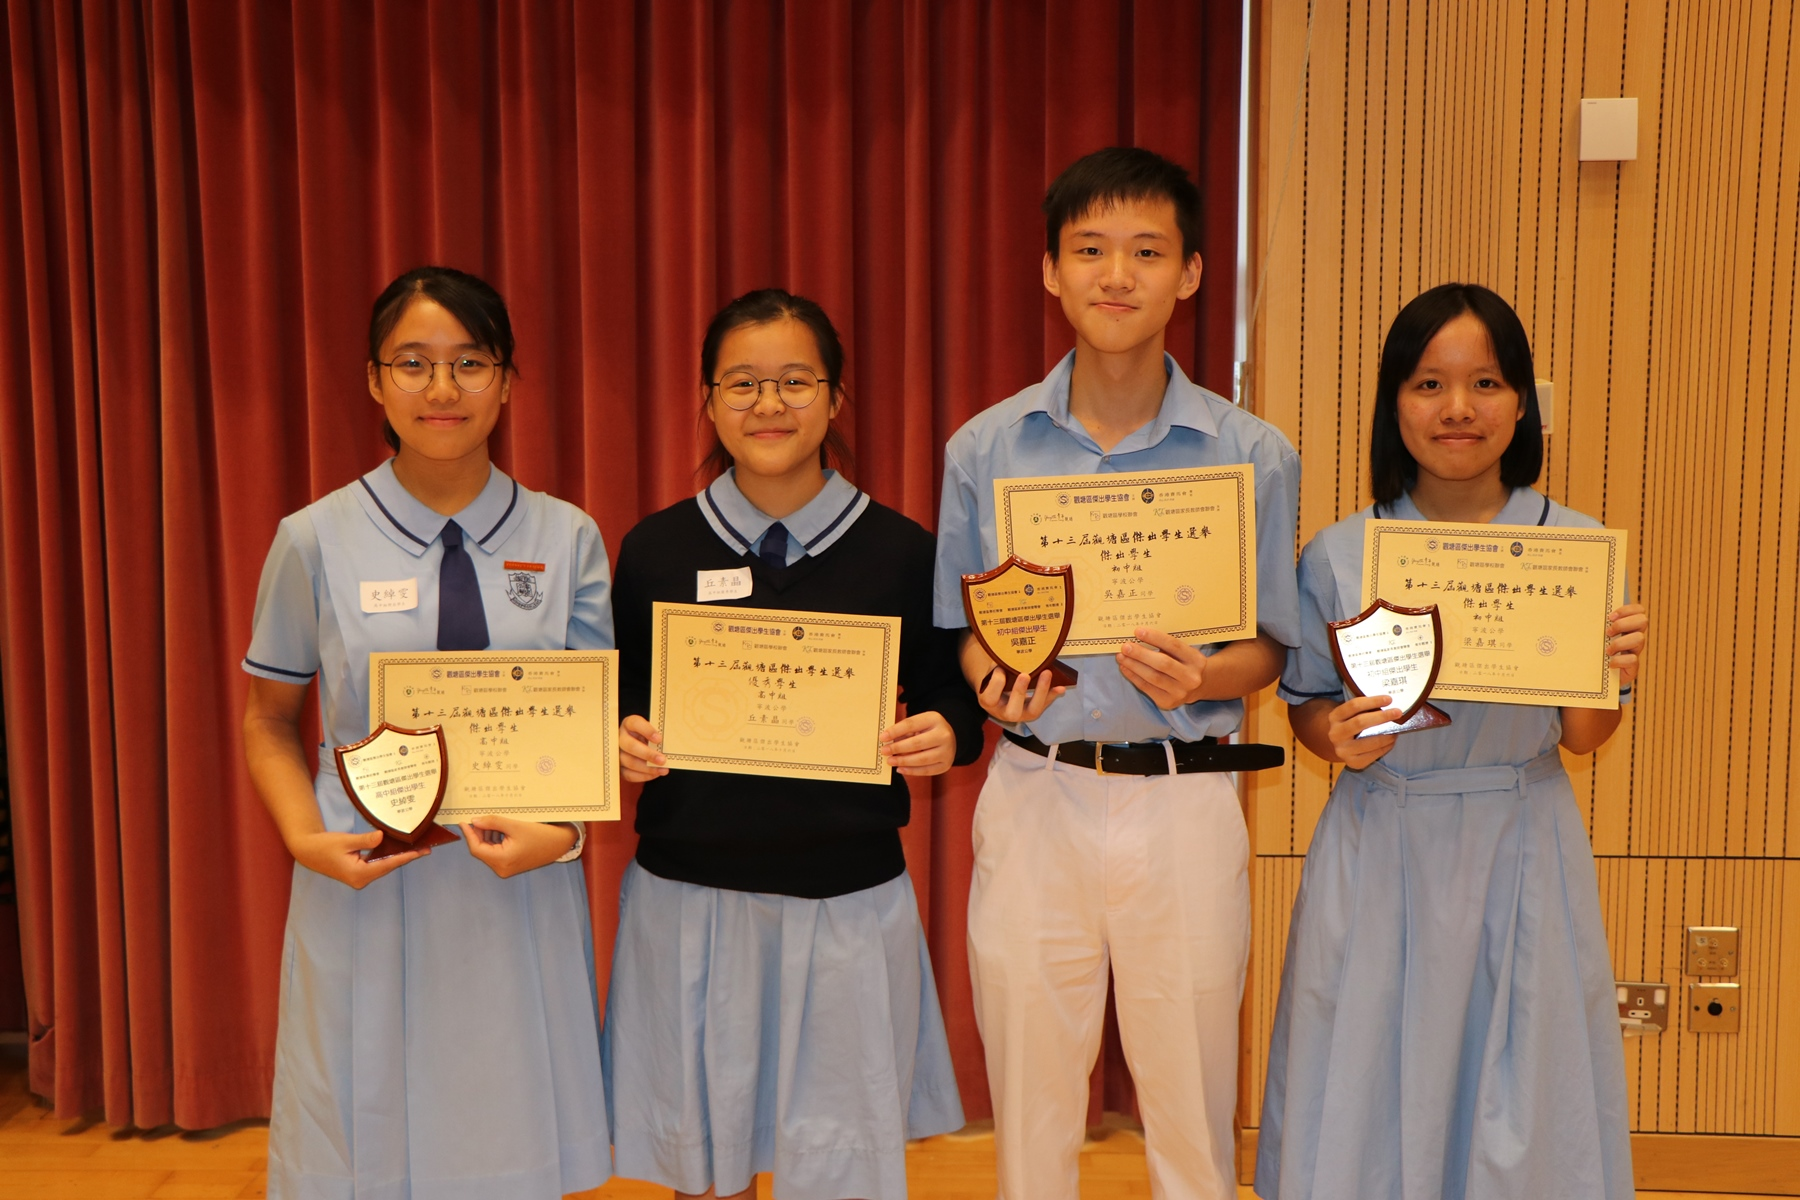 http://npc.edu.hk/sites/default/files/img_5801.jpg